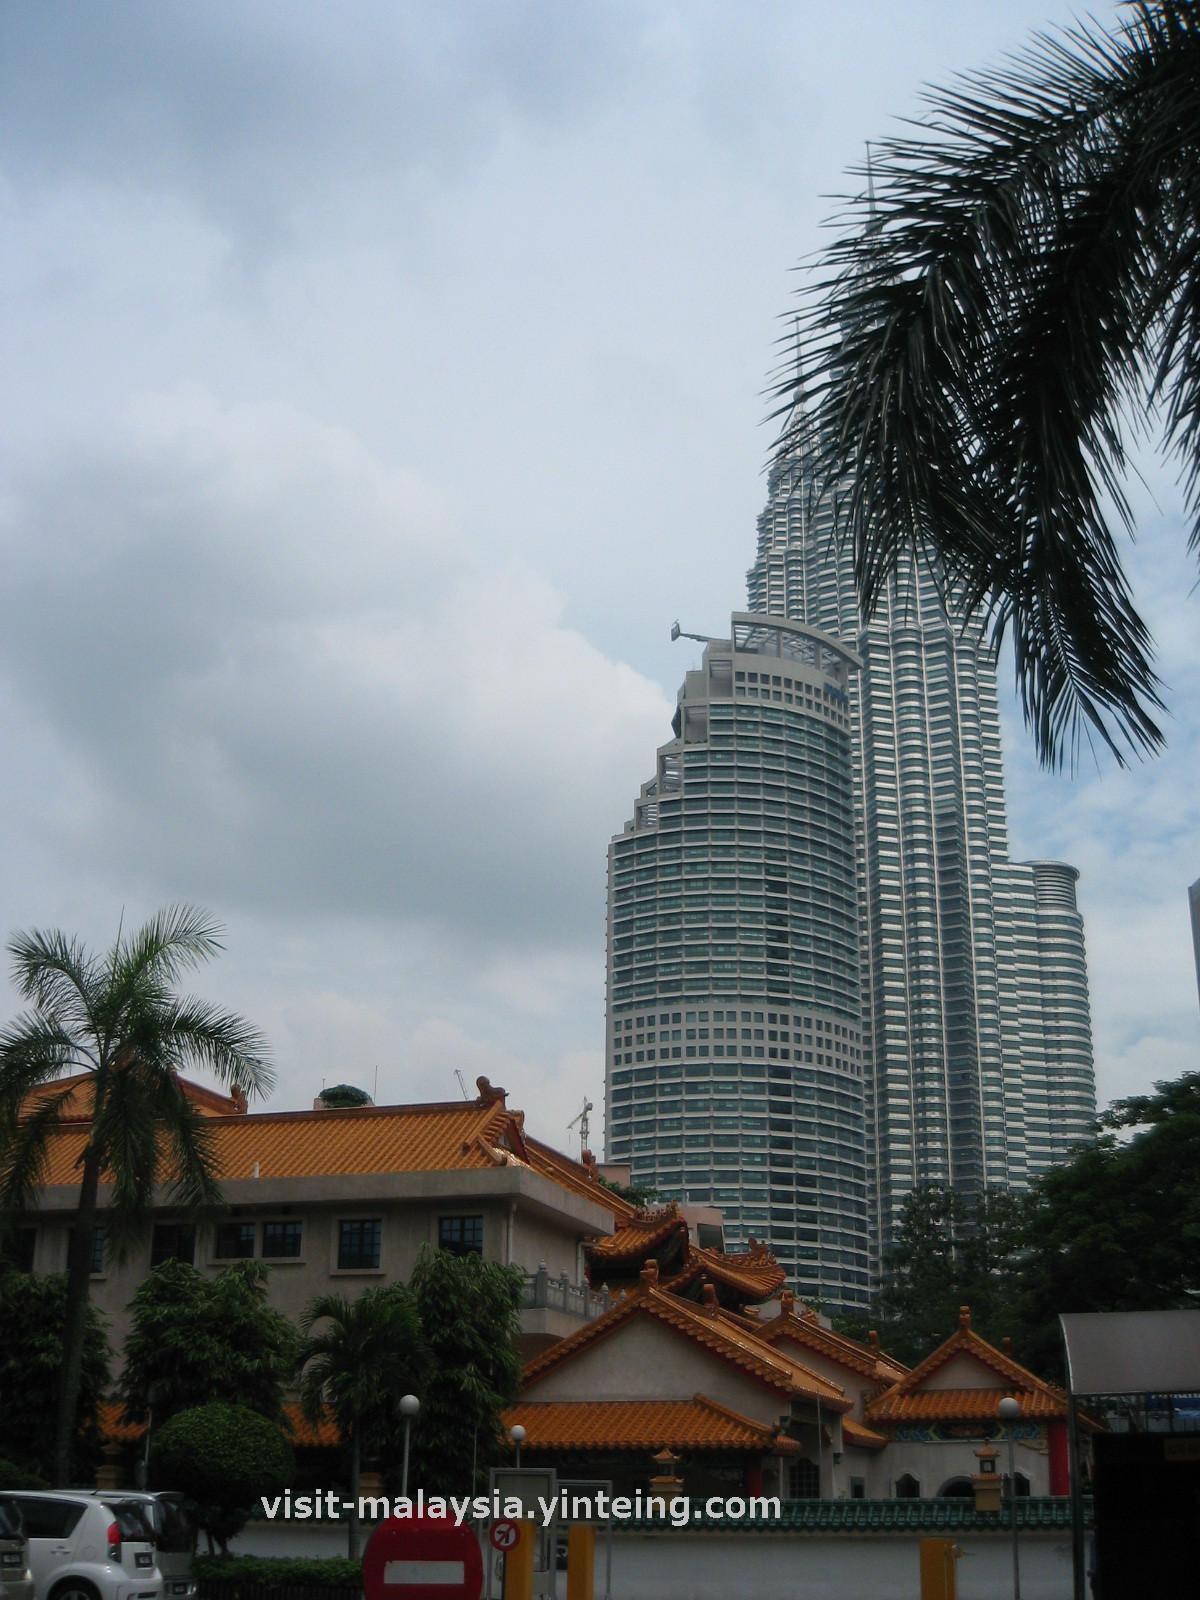 Where to get great vegetarian food in Kuala Lumpur